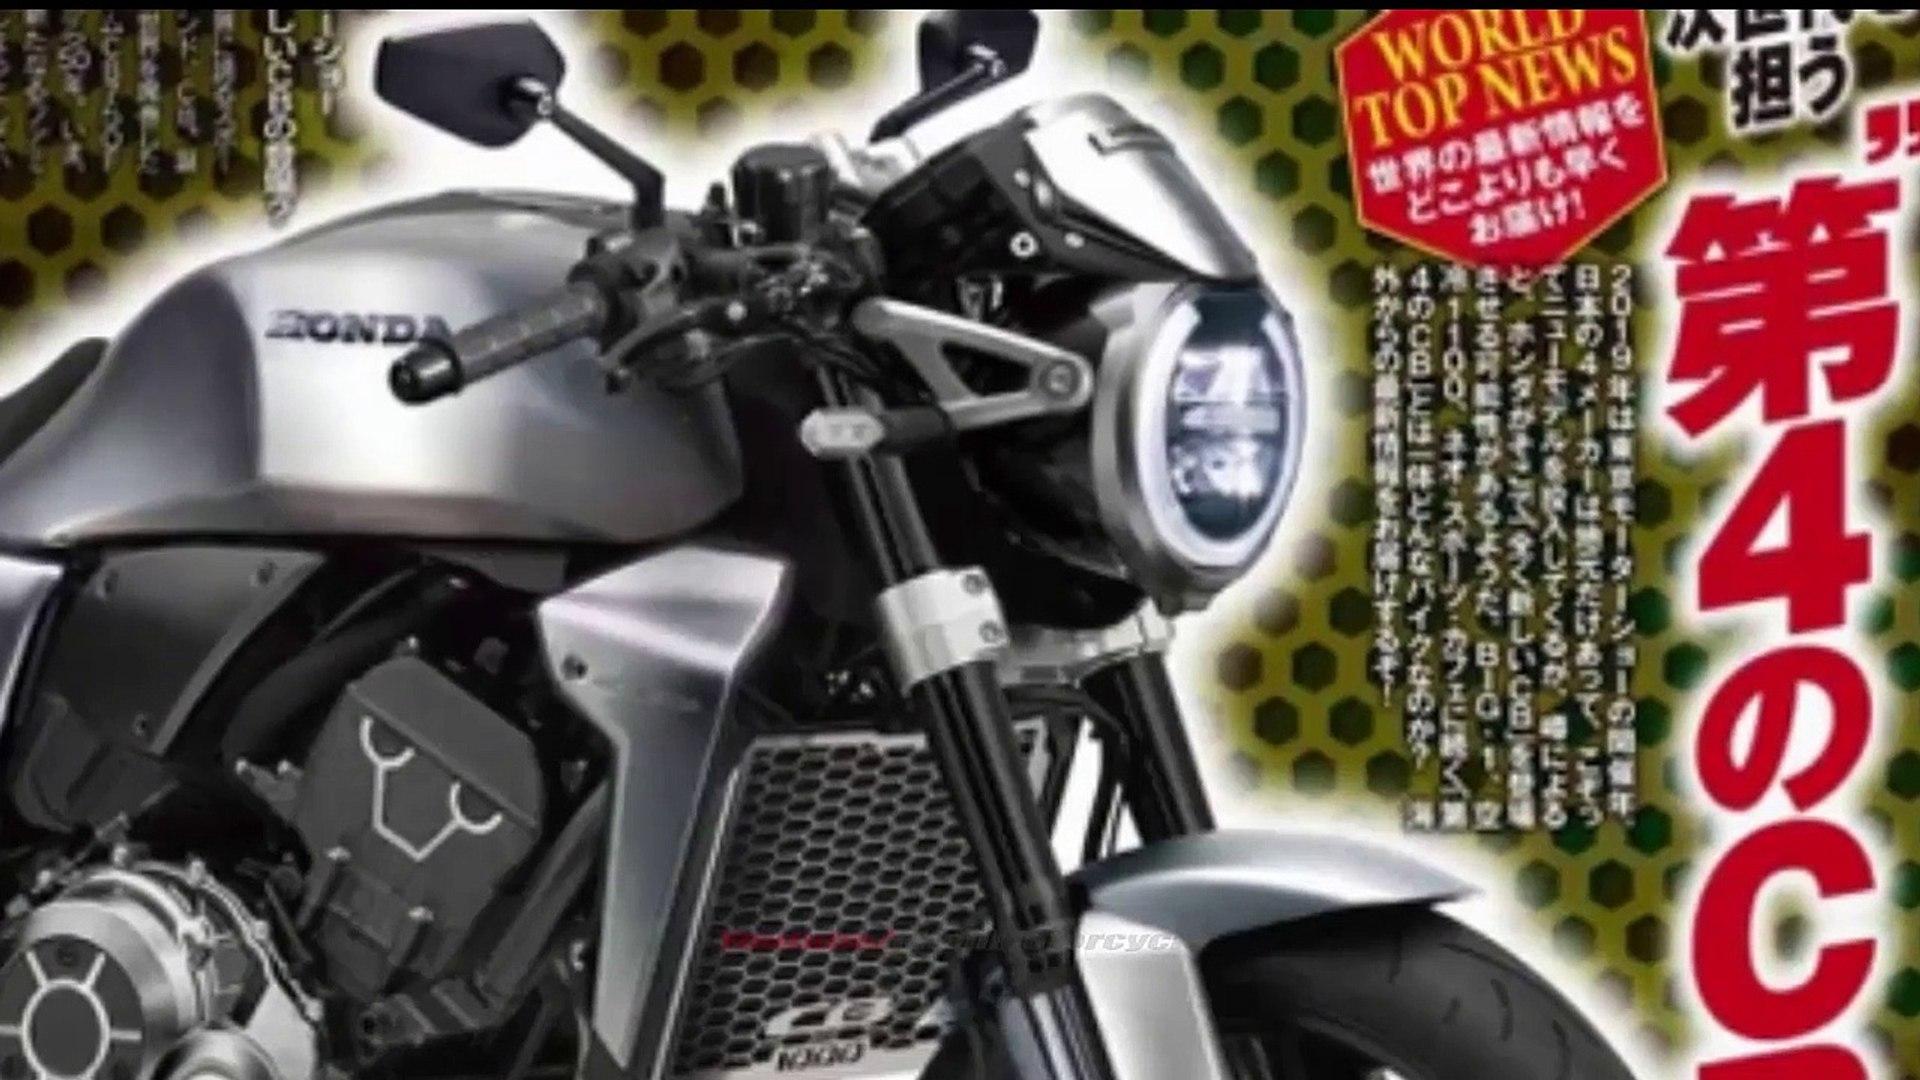 New Honda CB1000F Neo Sport Cafe Racer DNA From Honda CB1000R 2020 | Mich Motorcycle